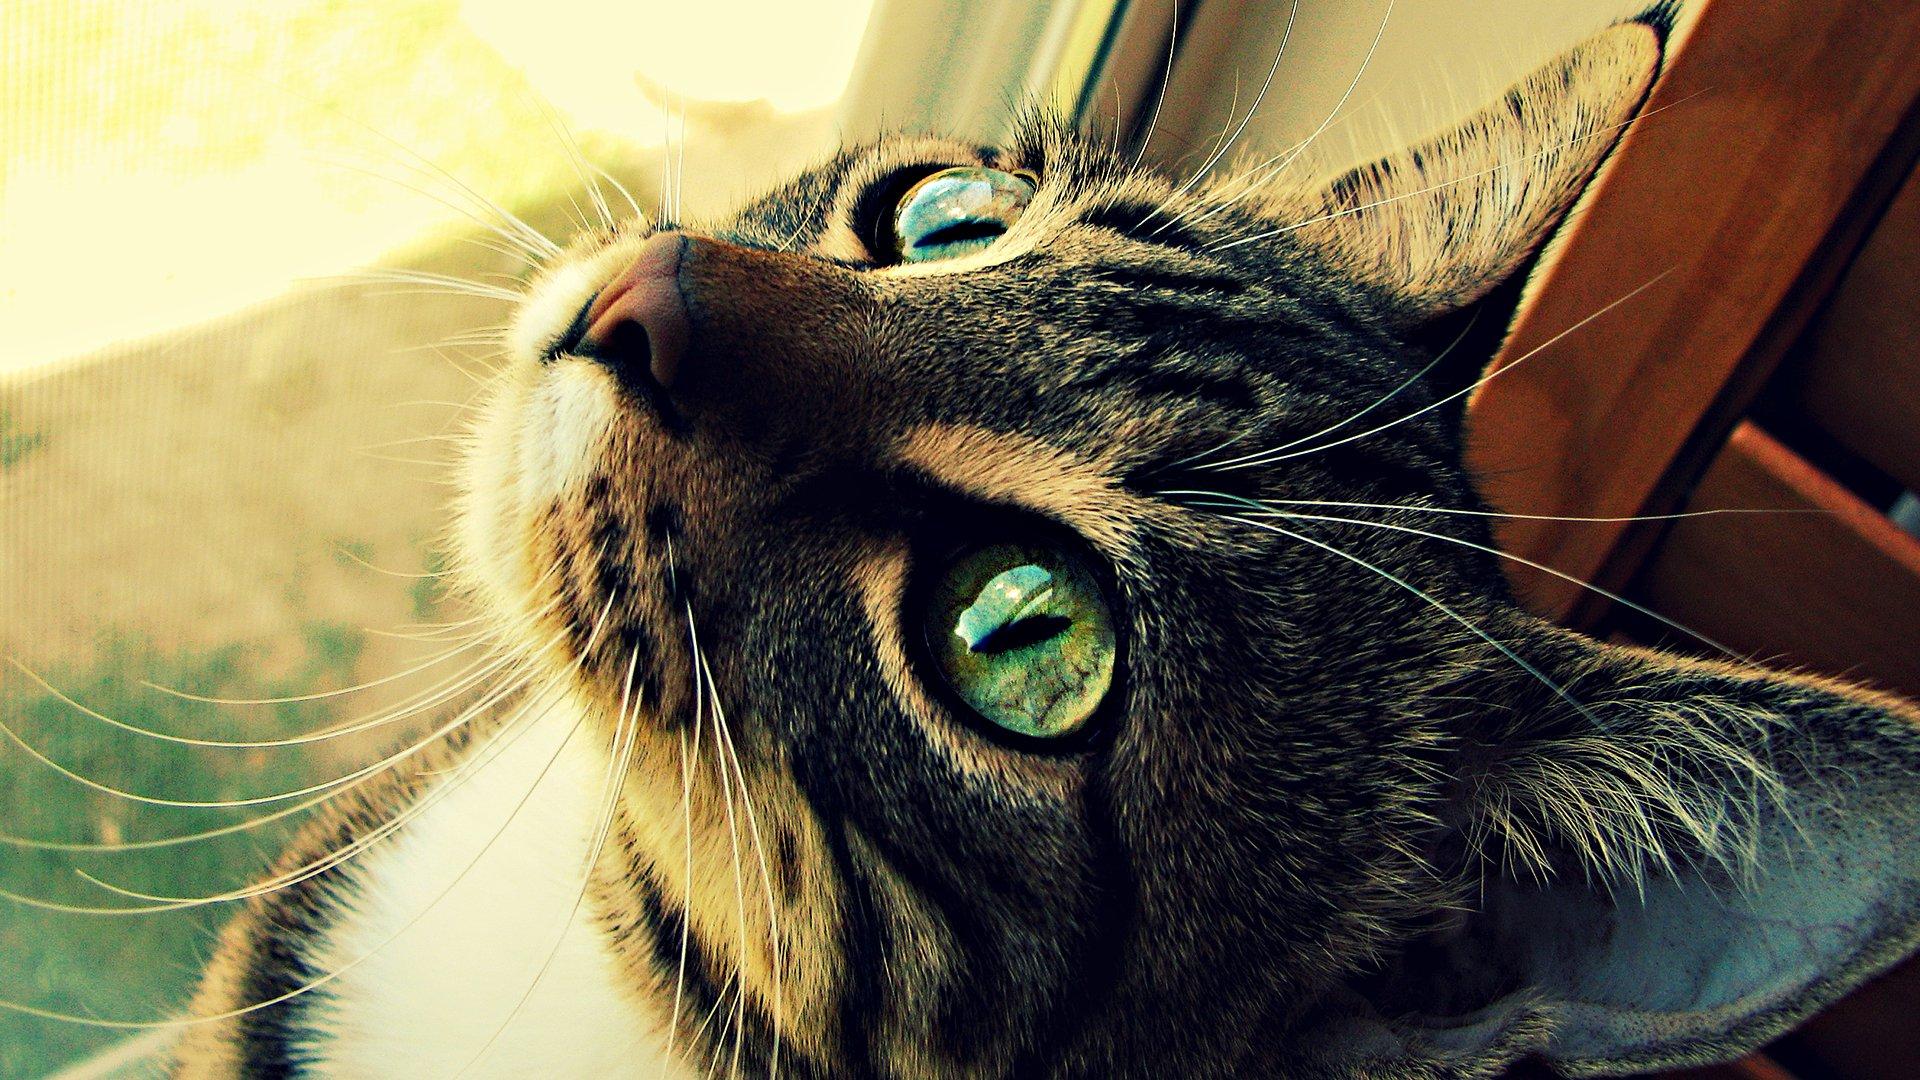 Cute Hacker Wallpaper Cat Full Hd Wallpaper And Background Image 1920x1080